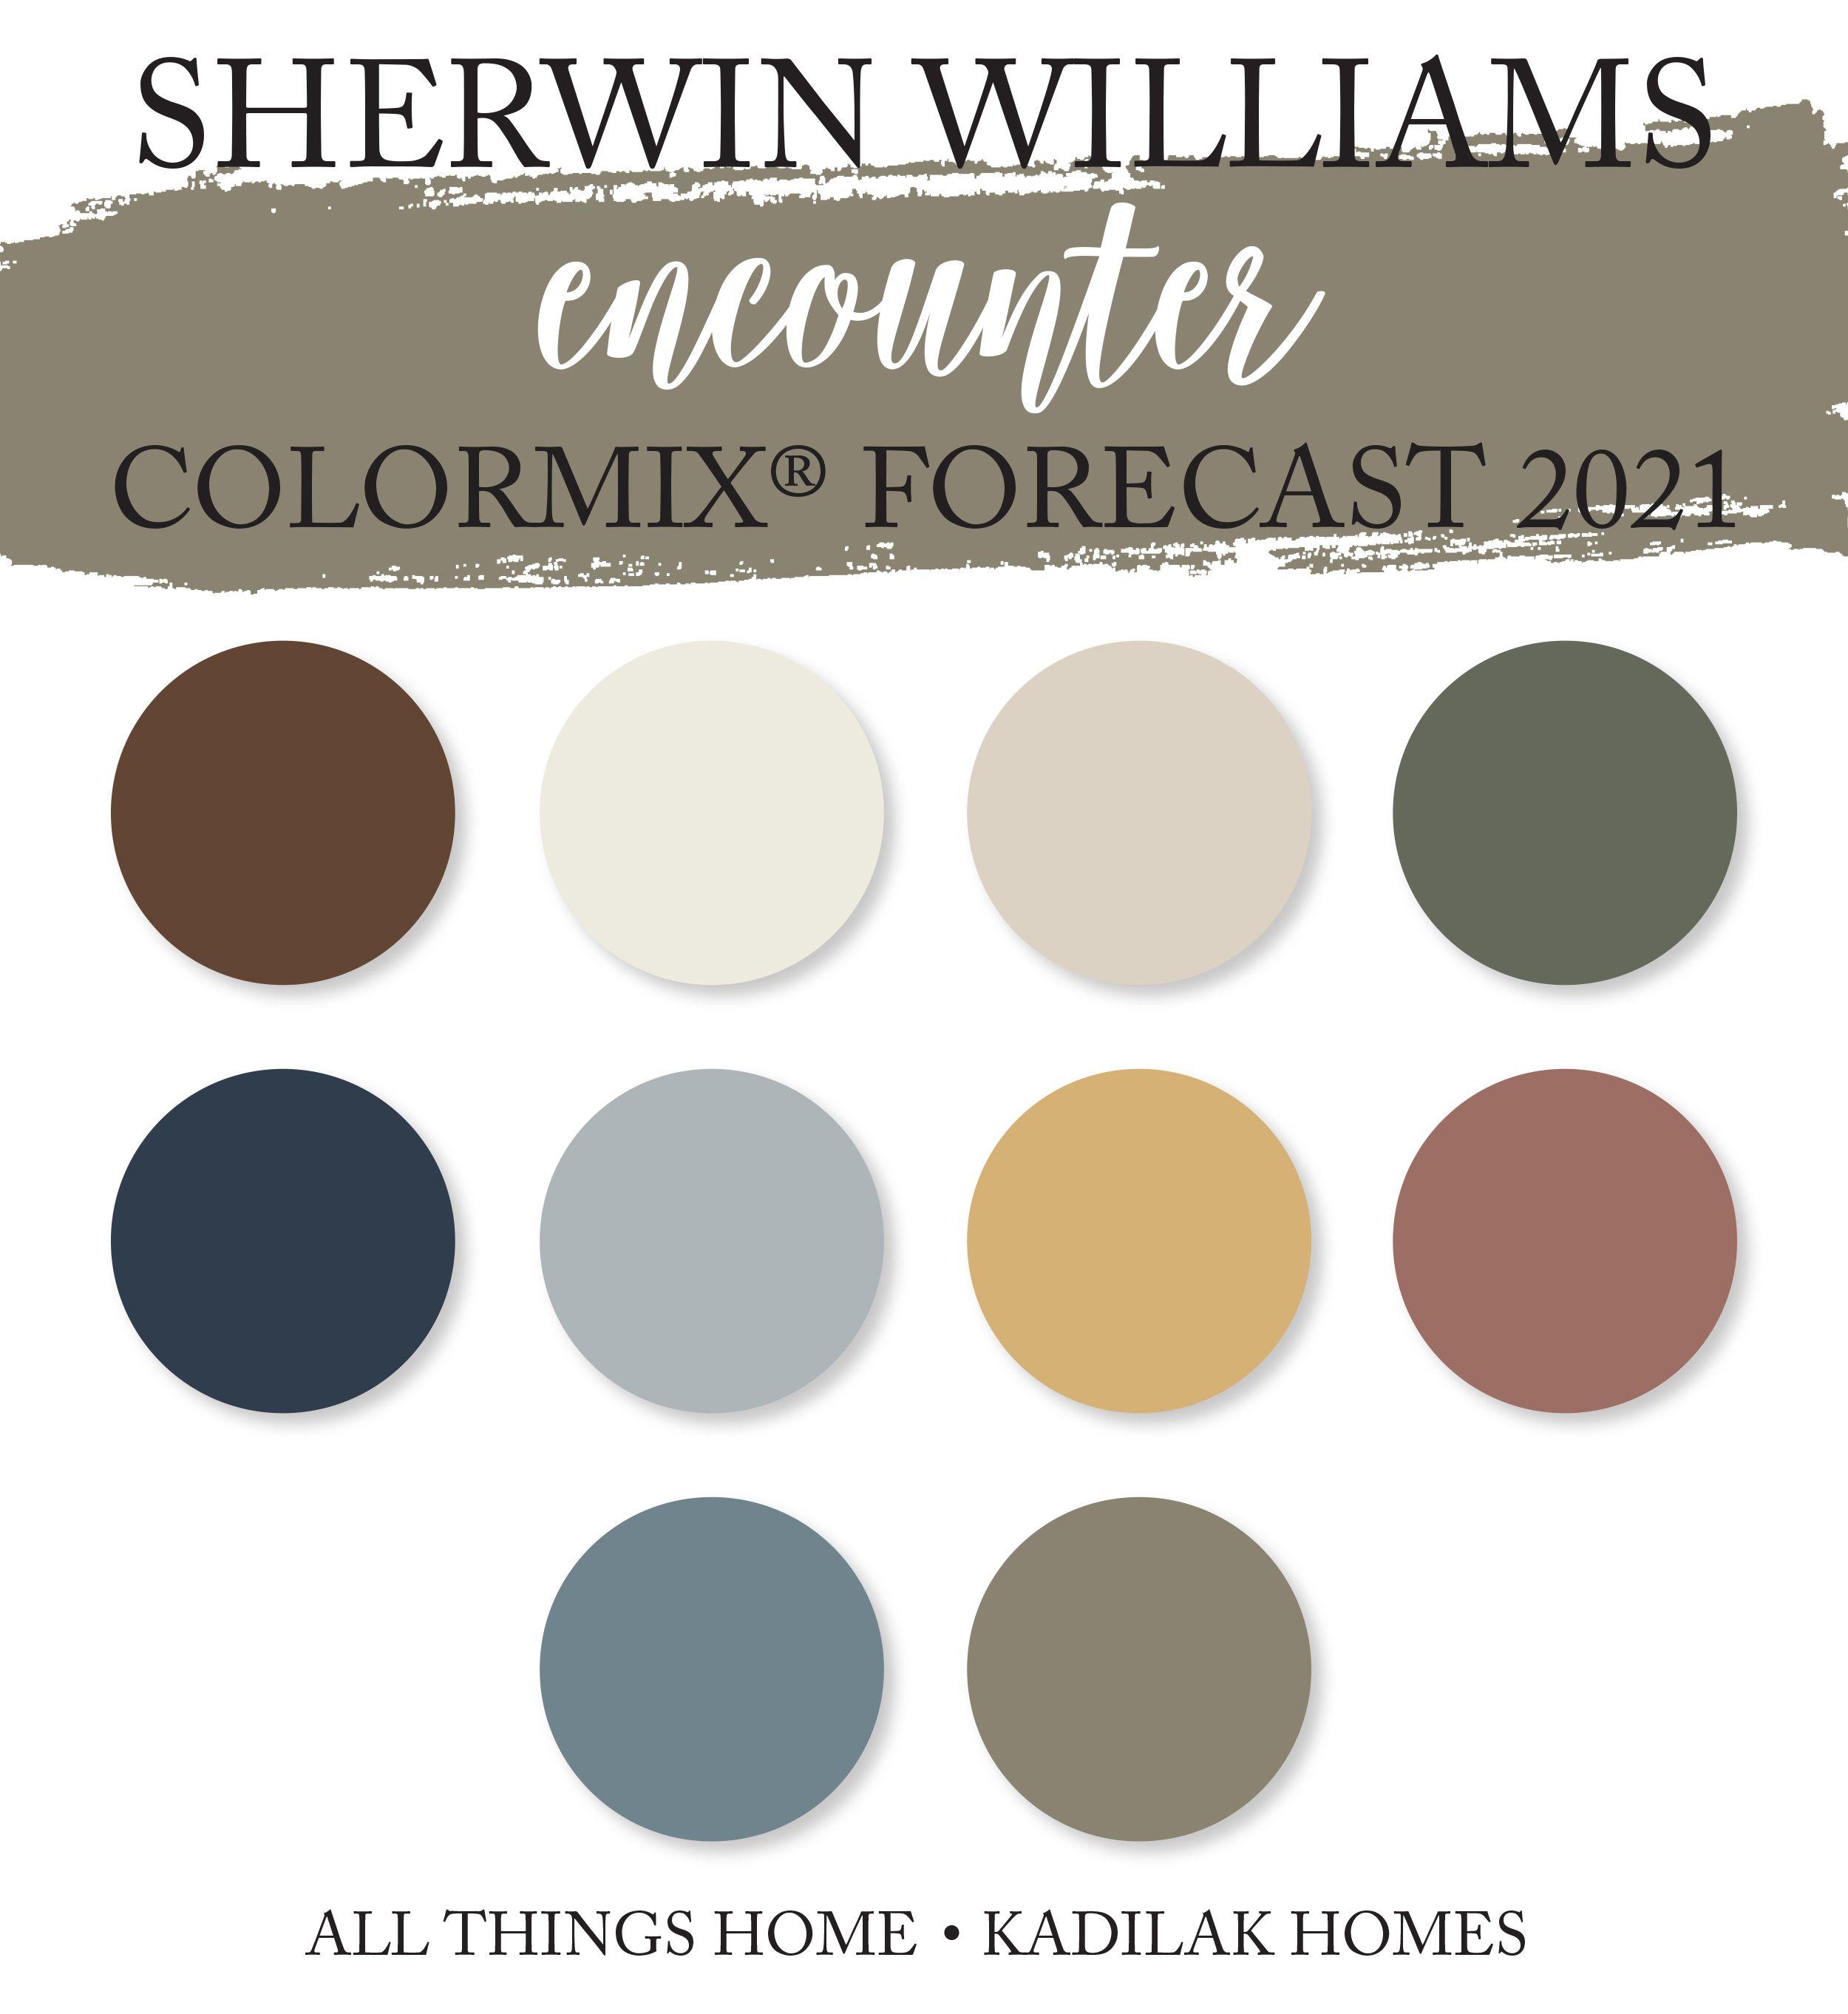 Sherwin Williams Colormix® Forecast 20   Trending paint colors ...